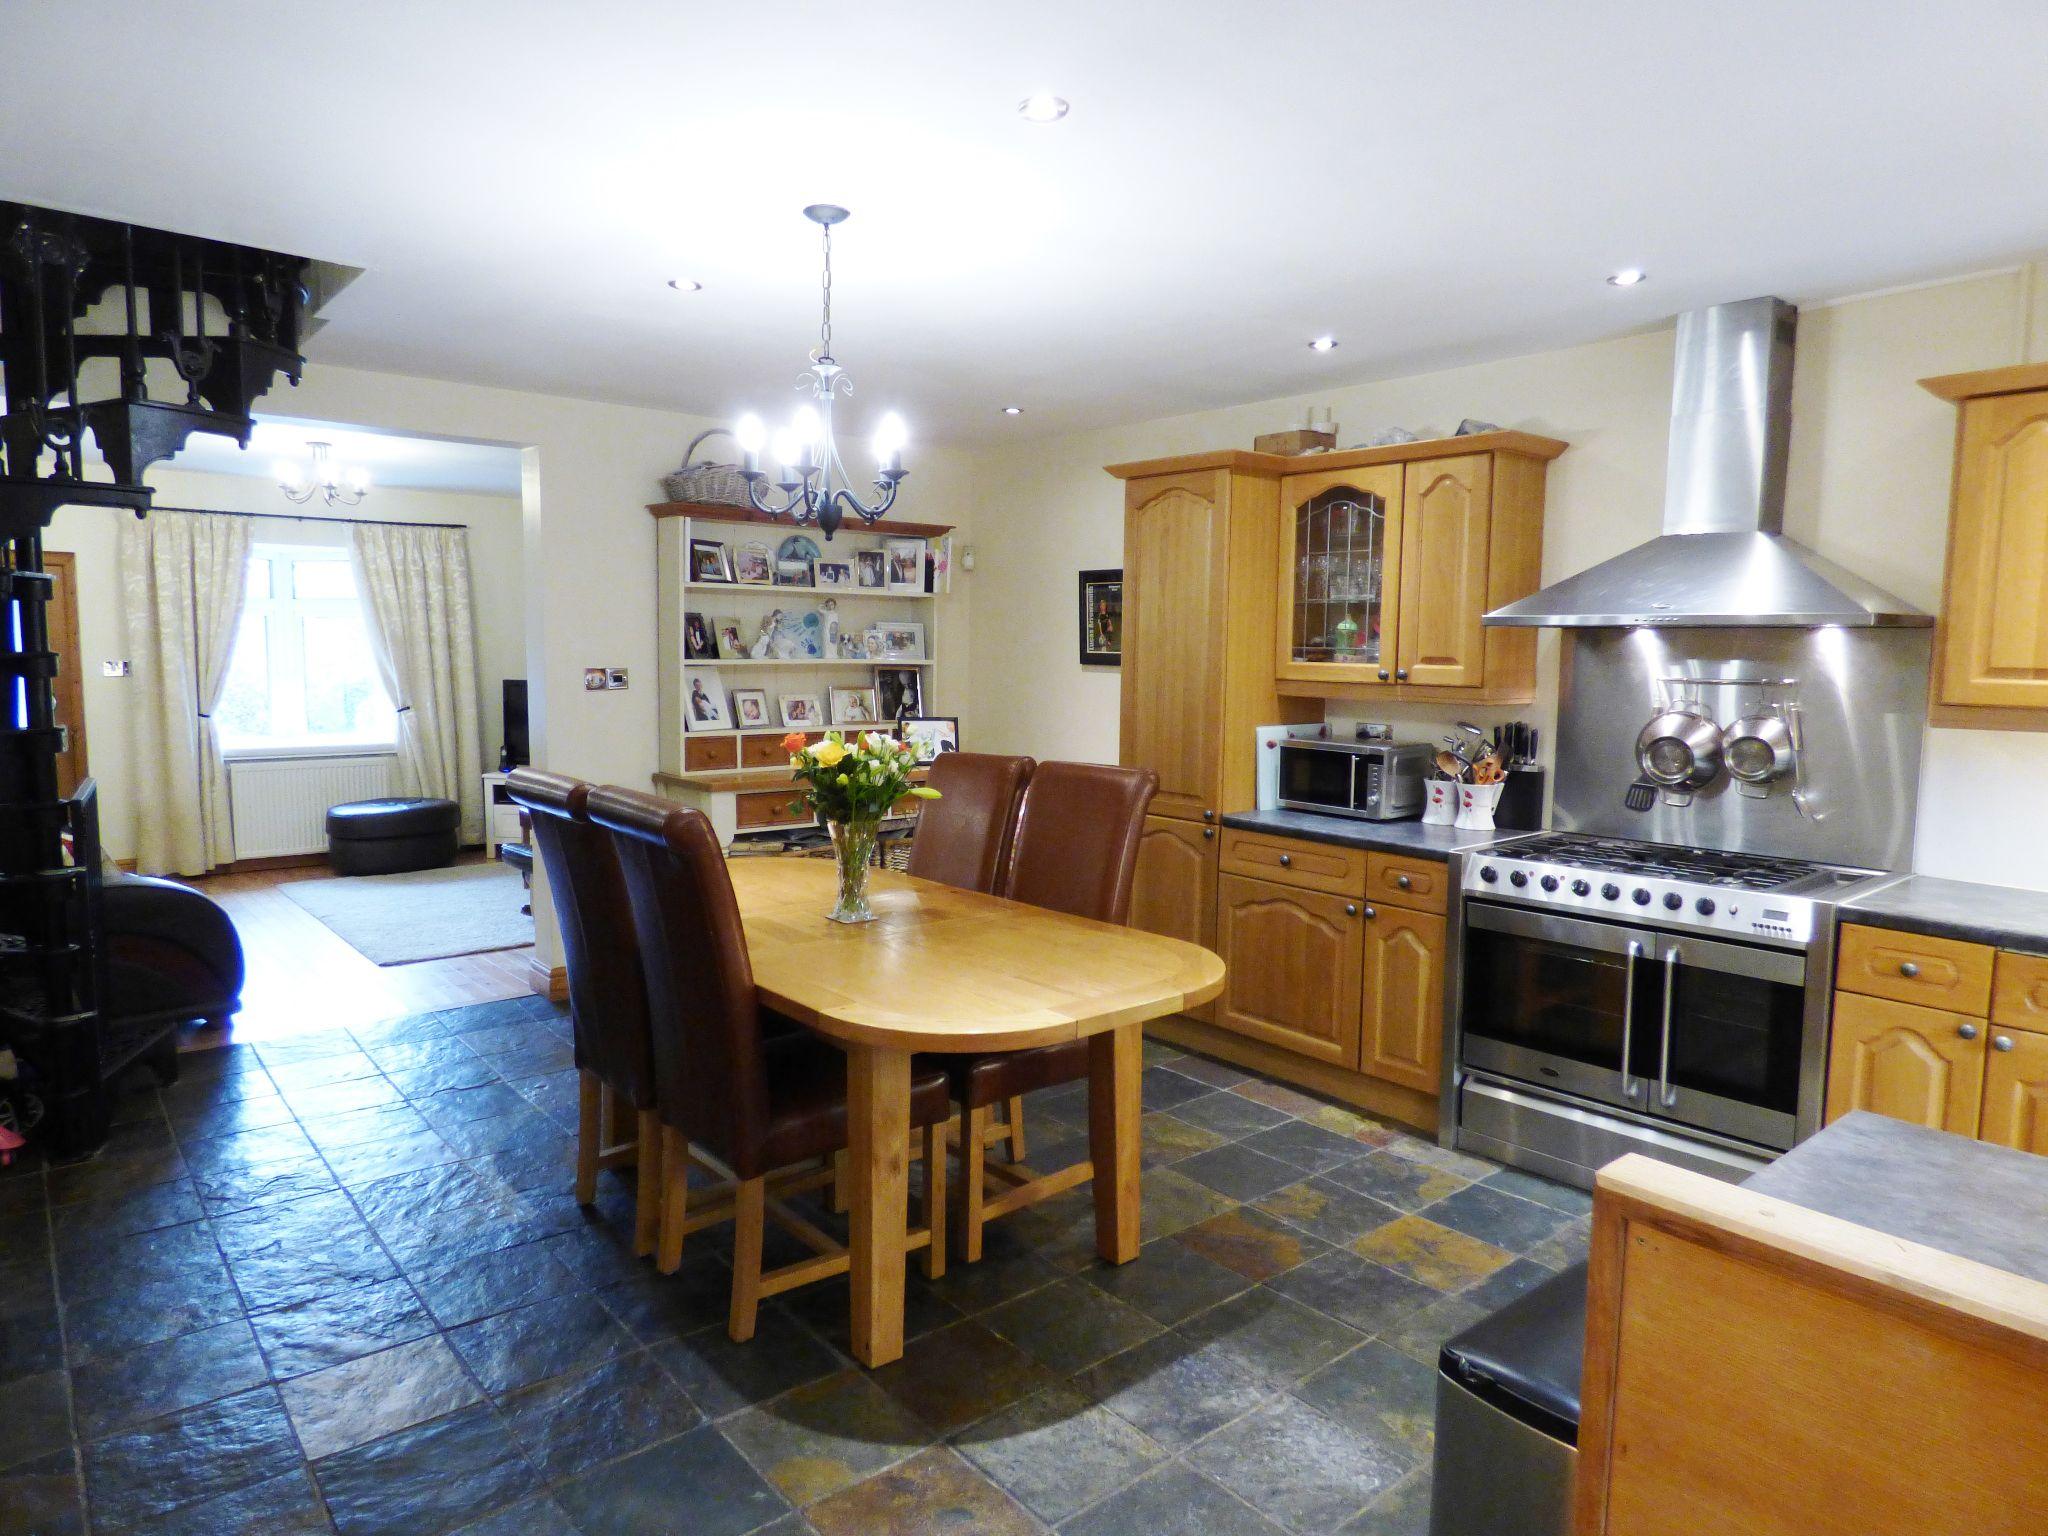 2 Bedroom Cottage House For Sale - Dining Kitchen